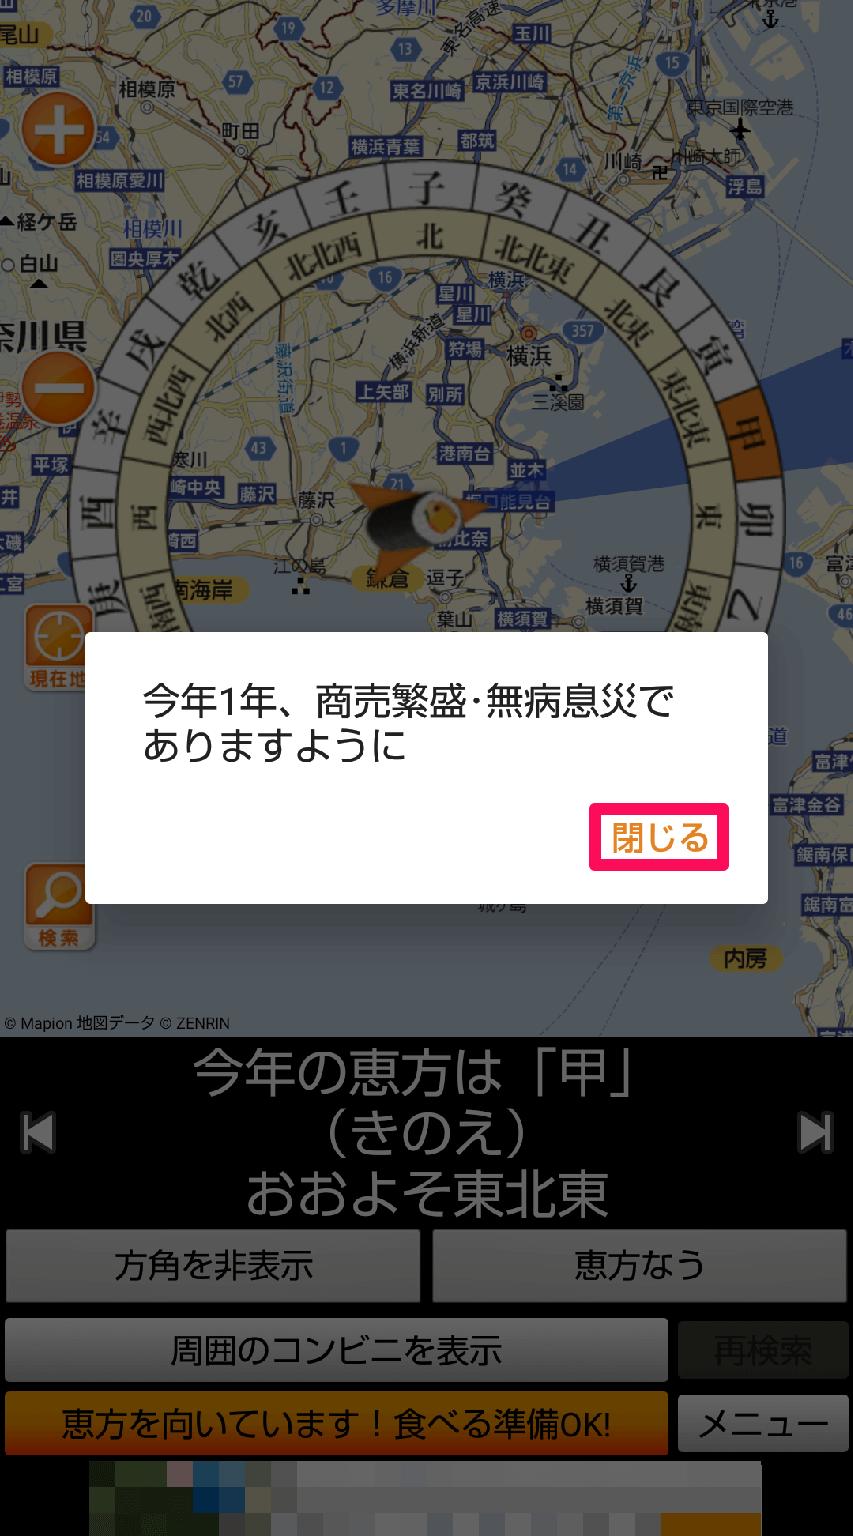 Android(アンドロイド)版&iPhone(アイフォーン)版「恵方マピオン」で1年間の商売繁盛・無病息災を祈願する画面